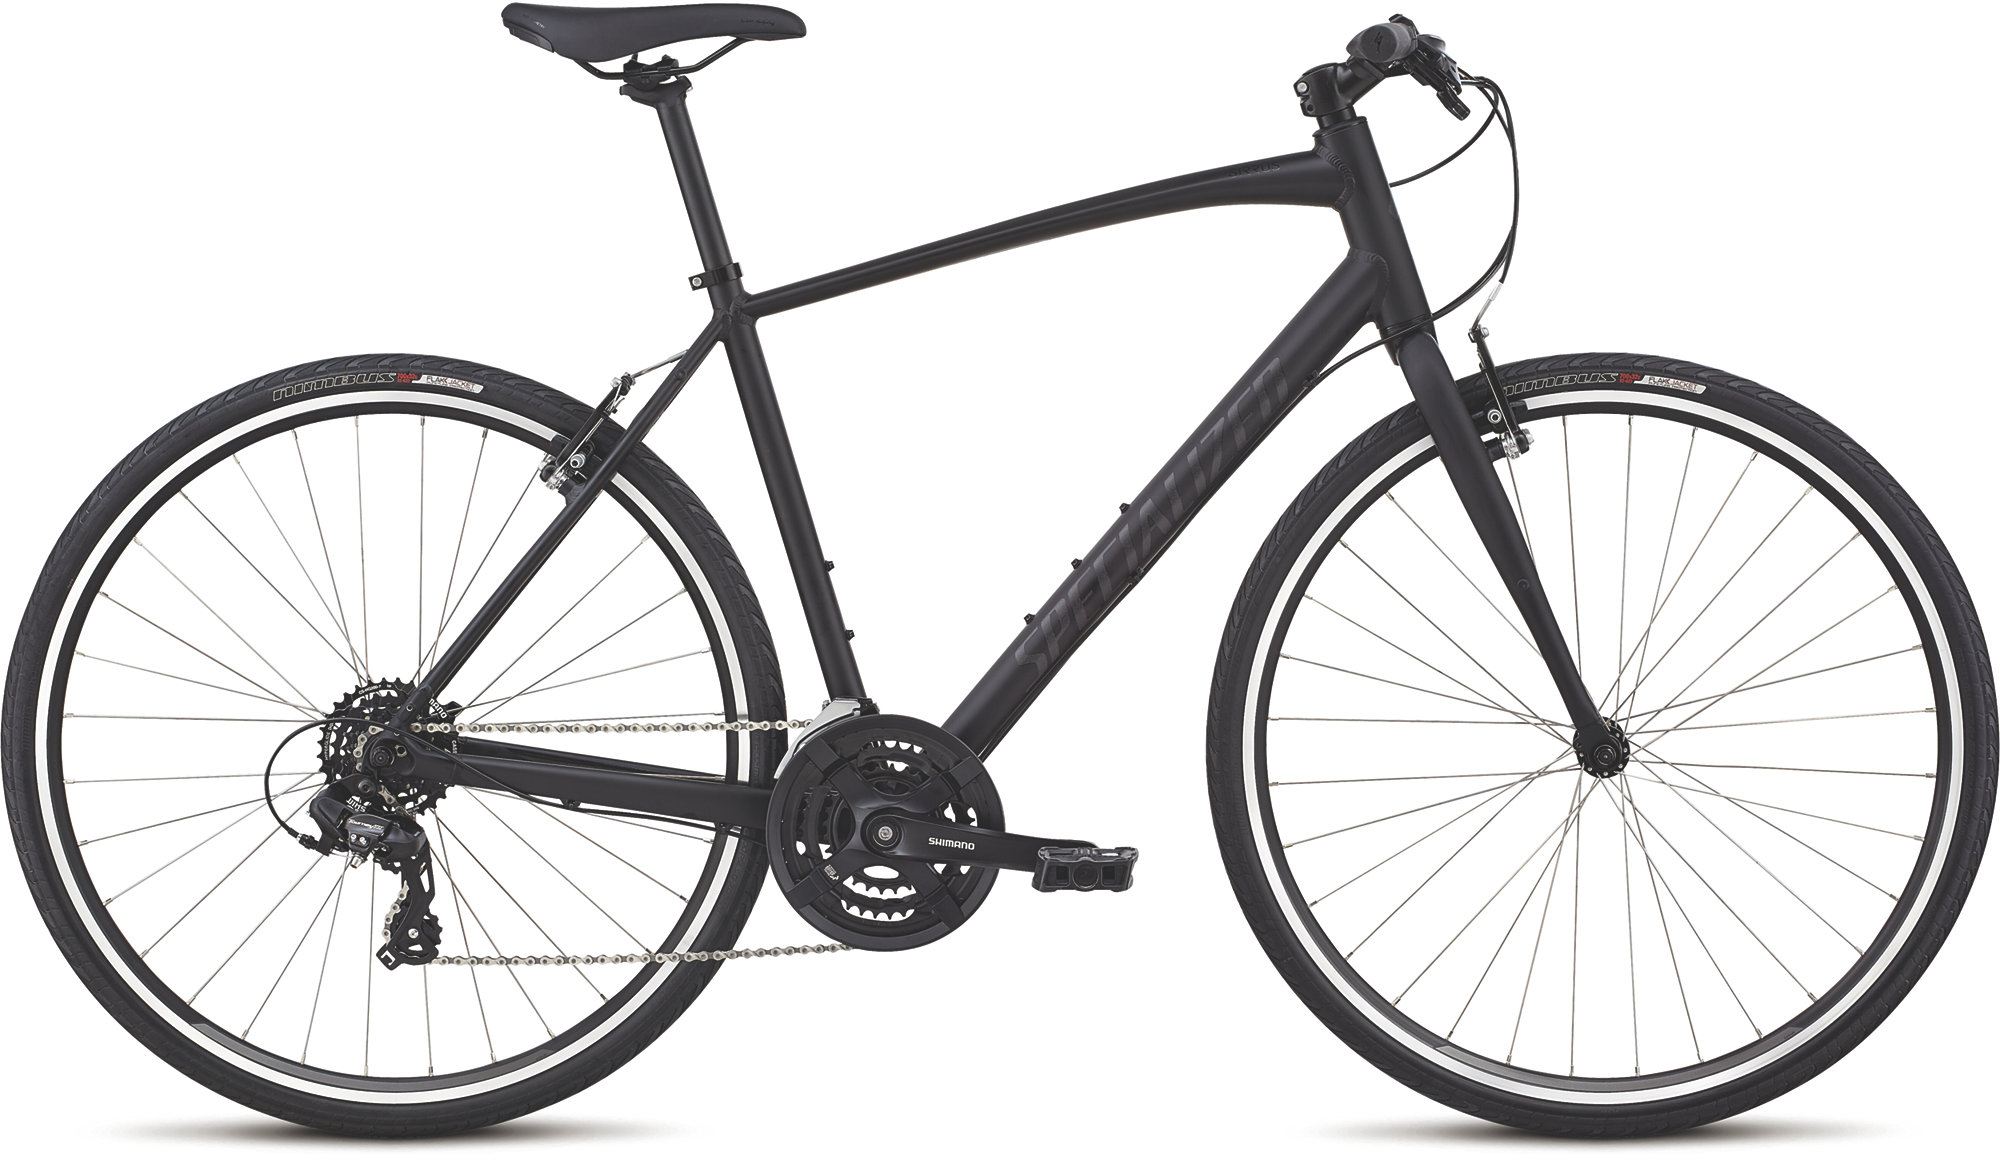 Specialized Sirrus Alloy Hybrid Bike 2020 Black